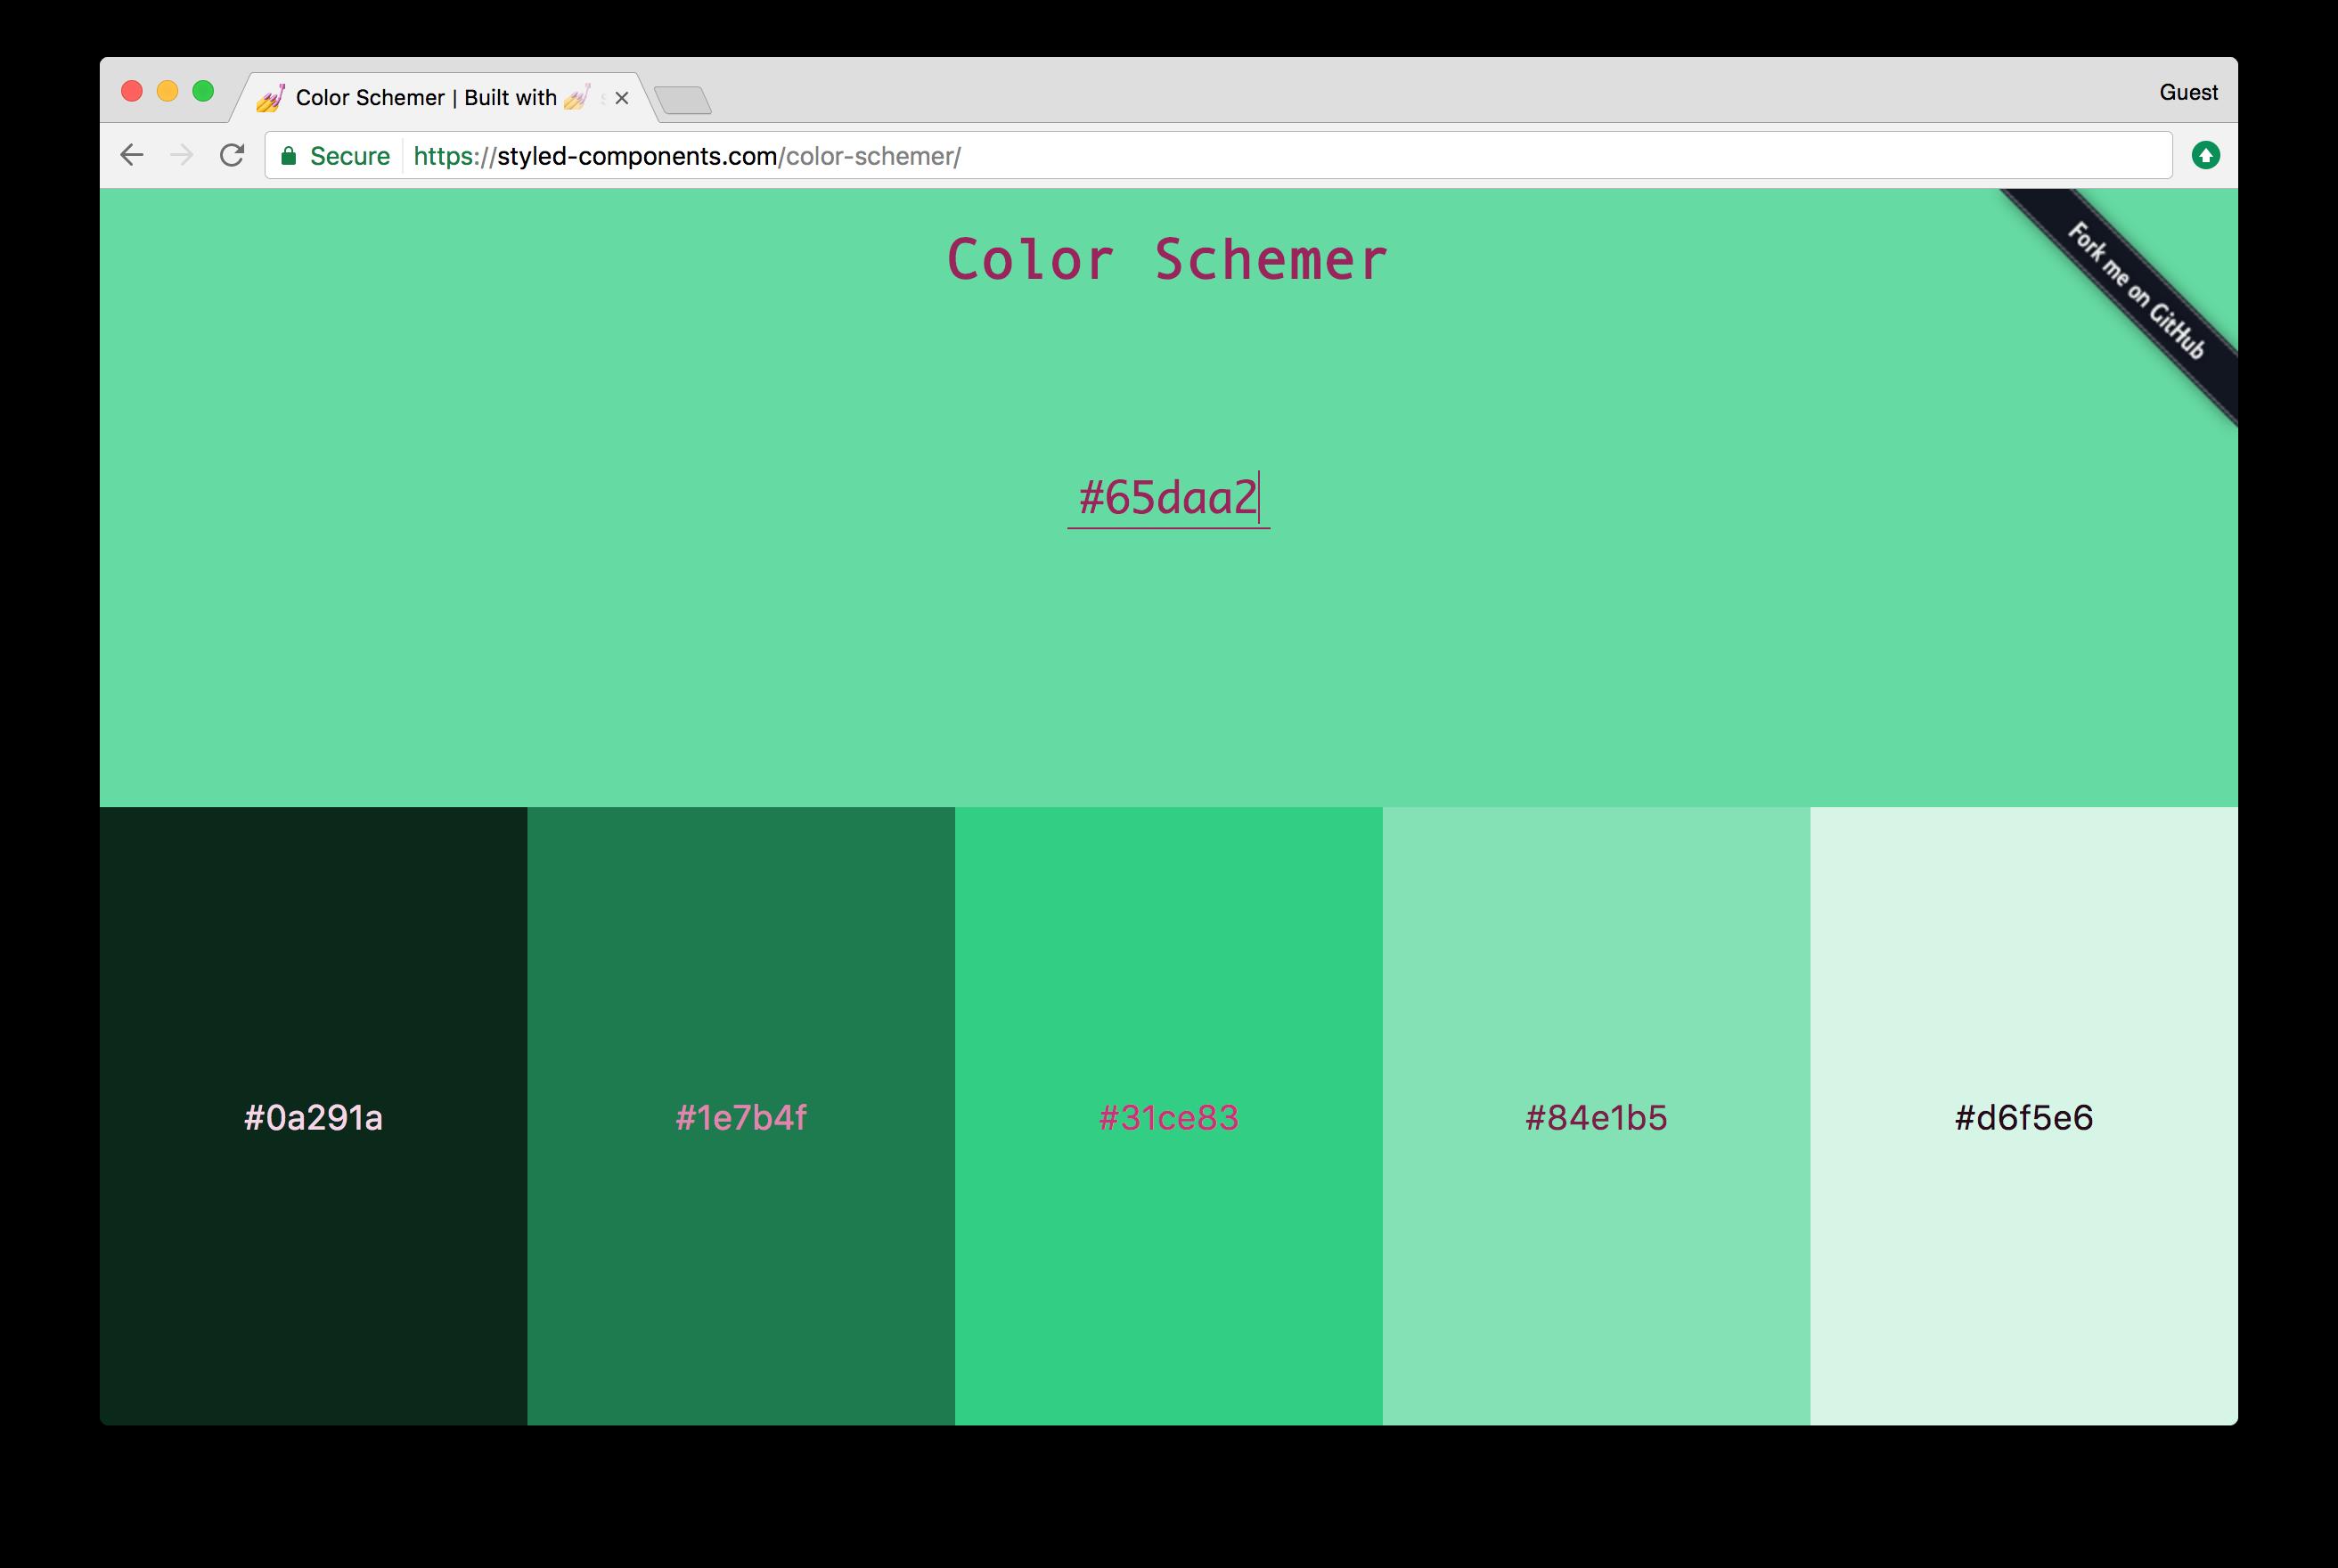 The color schemer app